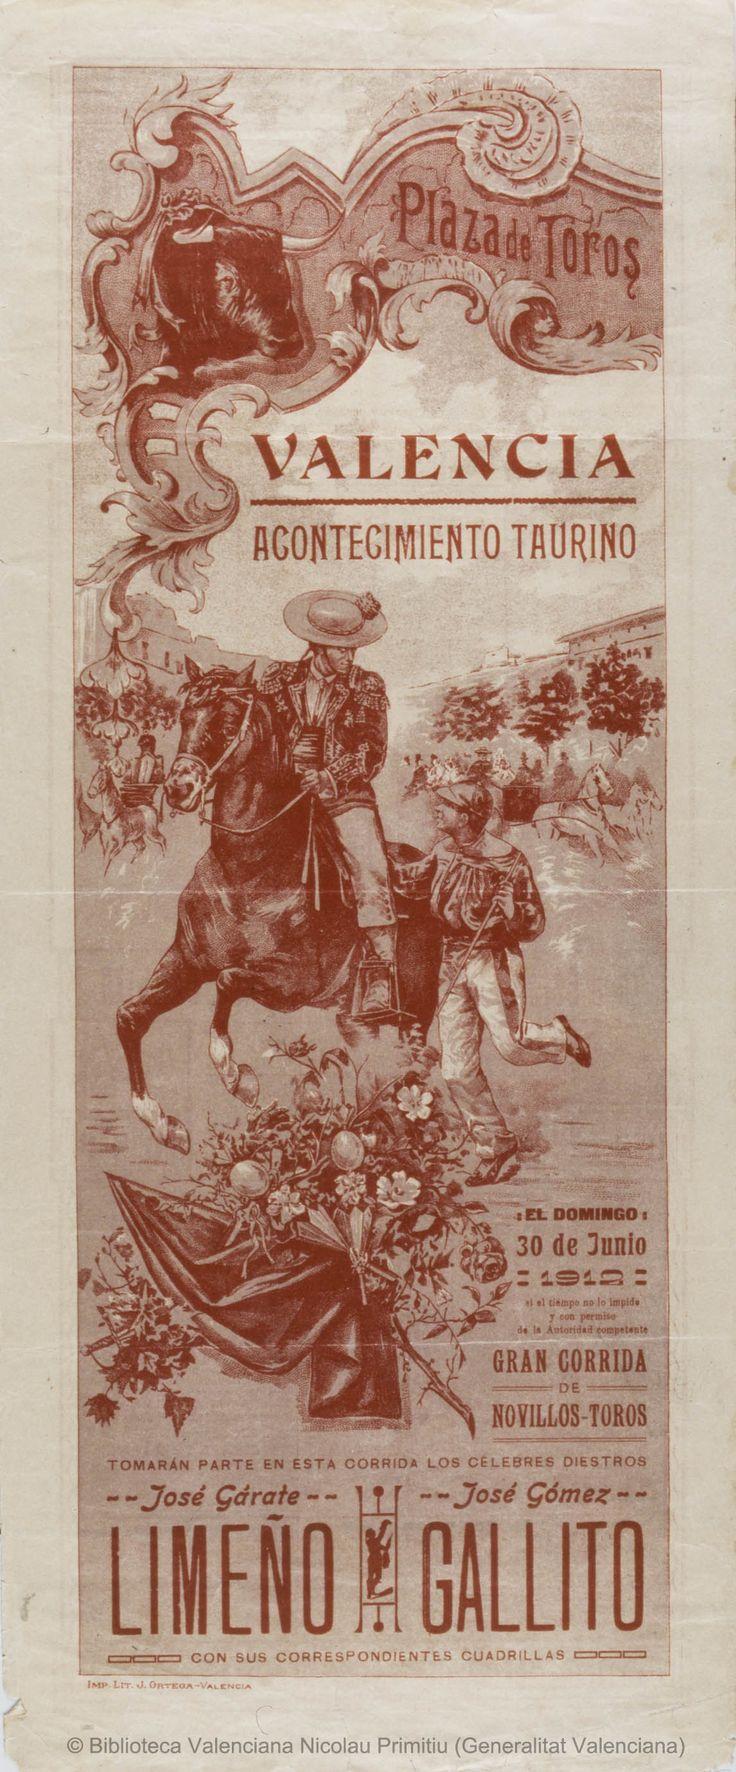 Anónimo. (S. XX)   Plaza de Toros Valencia ... [Material gráfico] : El Domingo 30 de Junio 1912 ... : Gran corrida de novillos-toros ... — [S.l. : s.n., 1912?] (Valencia : Imp. Lit. J. Ortega)  1 lám. (cartel) : col. ; 49'5 x 20'5 cm